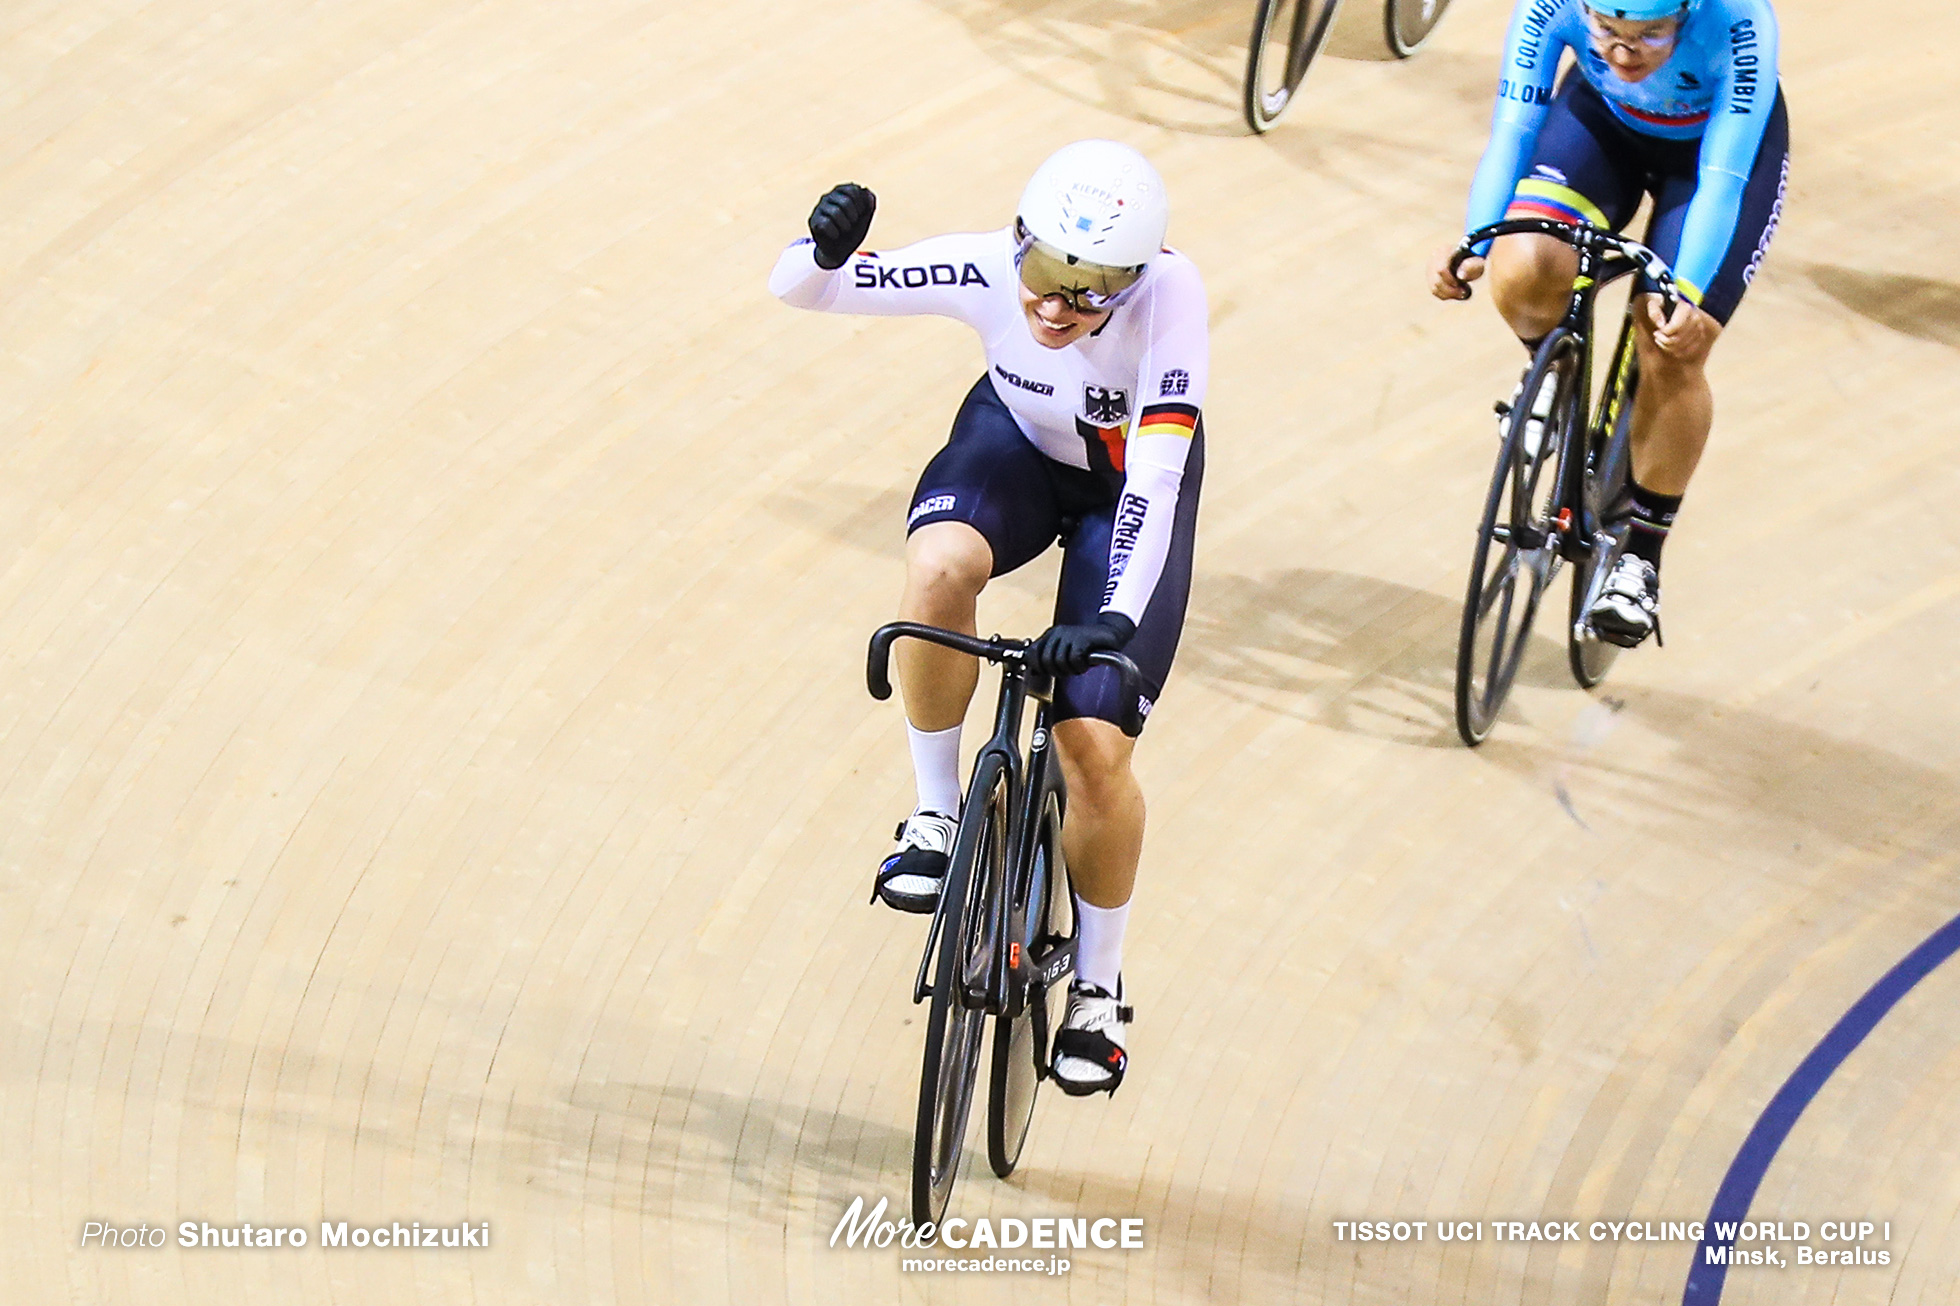 Final / Women's Keirin / TISSOT UCI TRACK CYCLING WORLD CUP I, Minsk, Beralus